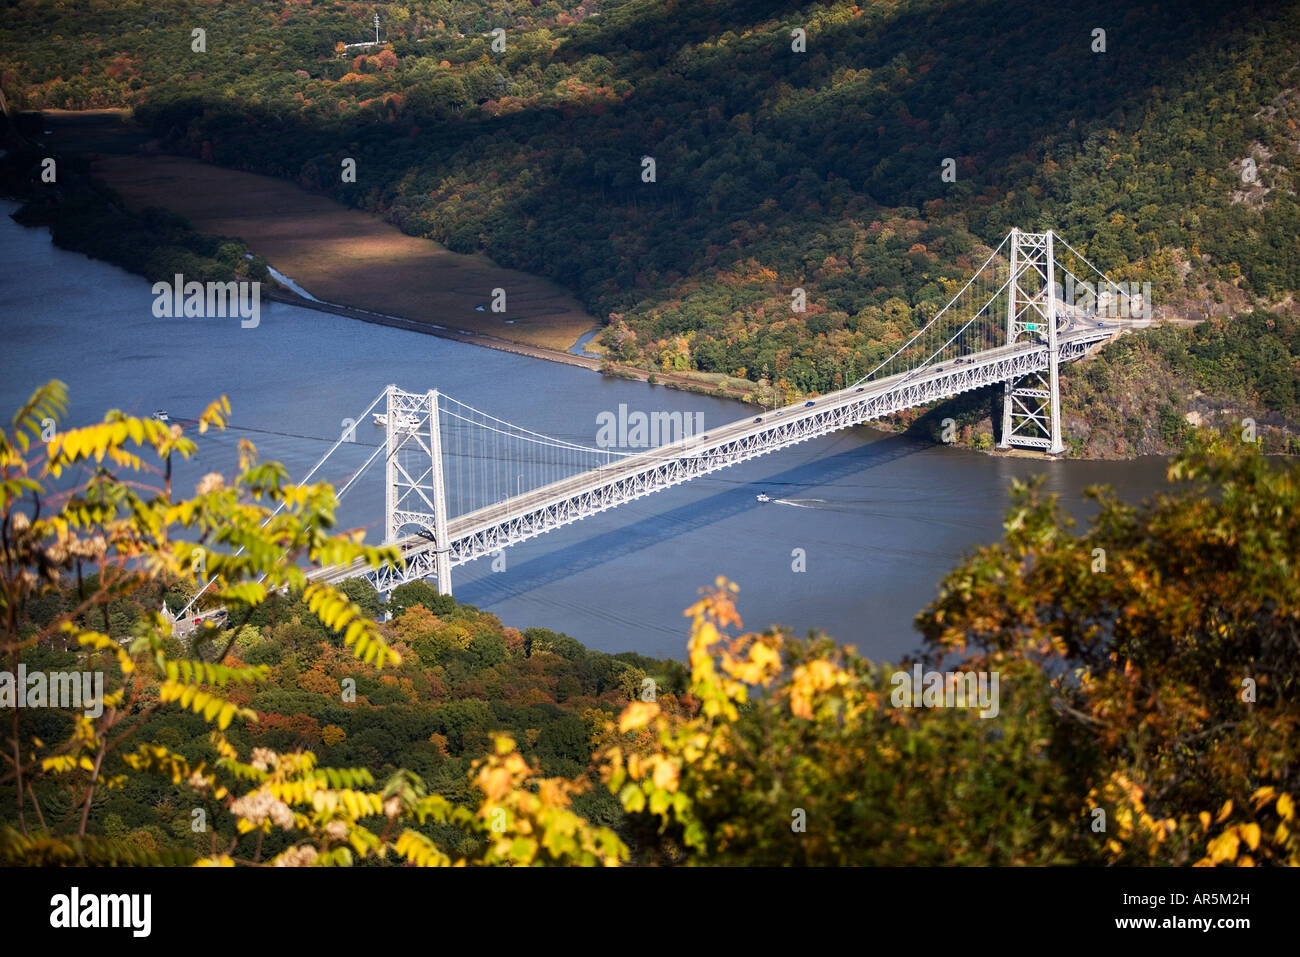 Bear mountain bridge over hudson river - Stock Image